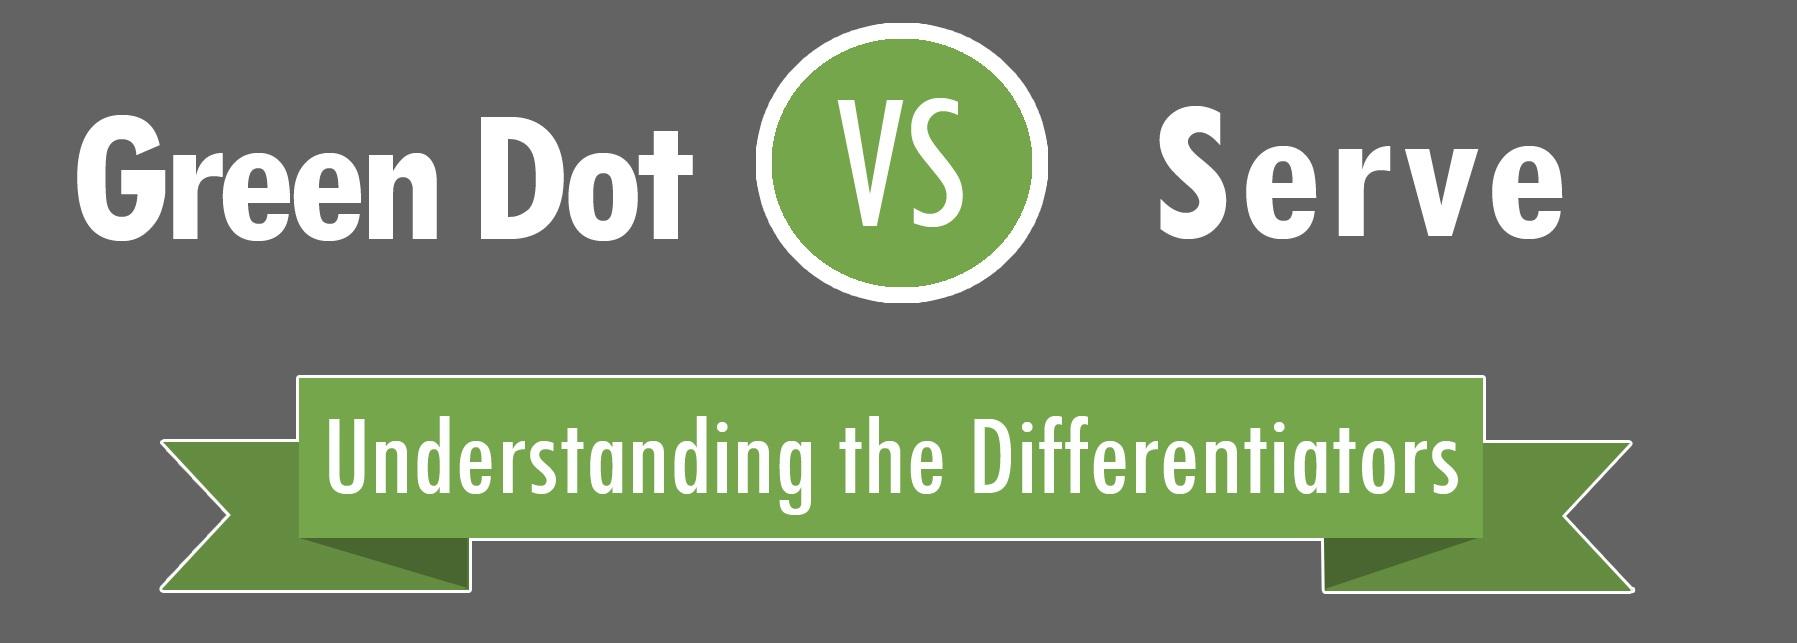 Green Dot VS Serve Infographic Primary image